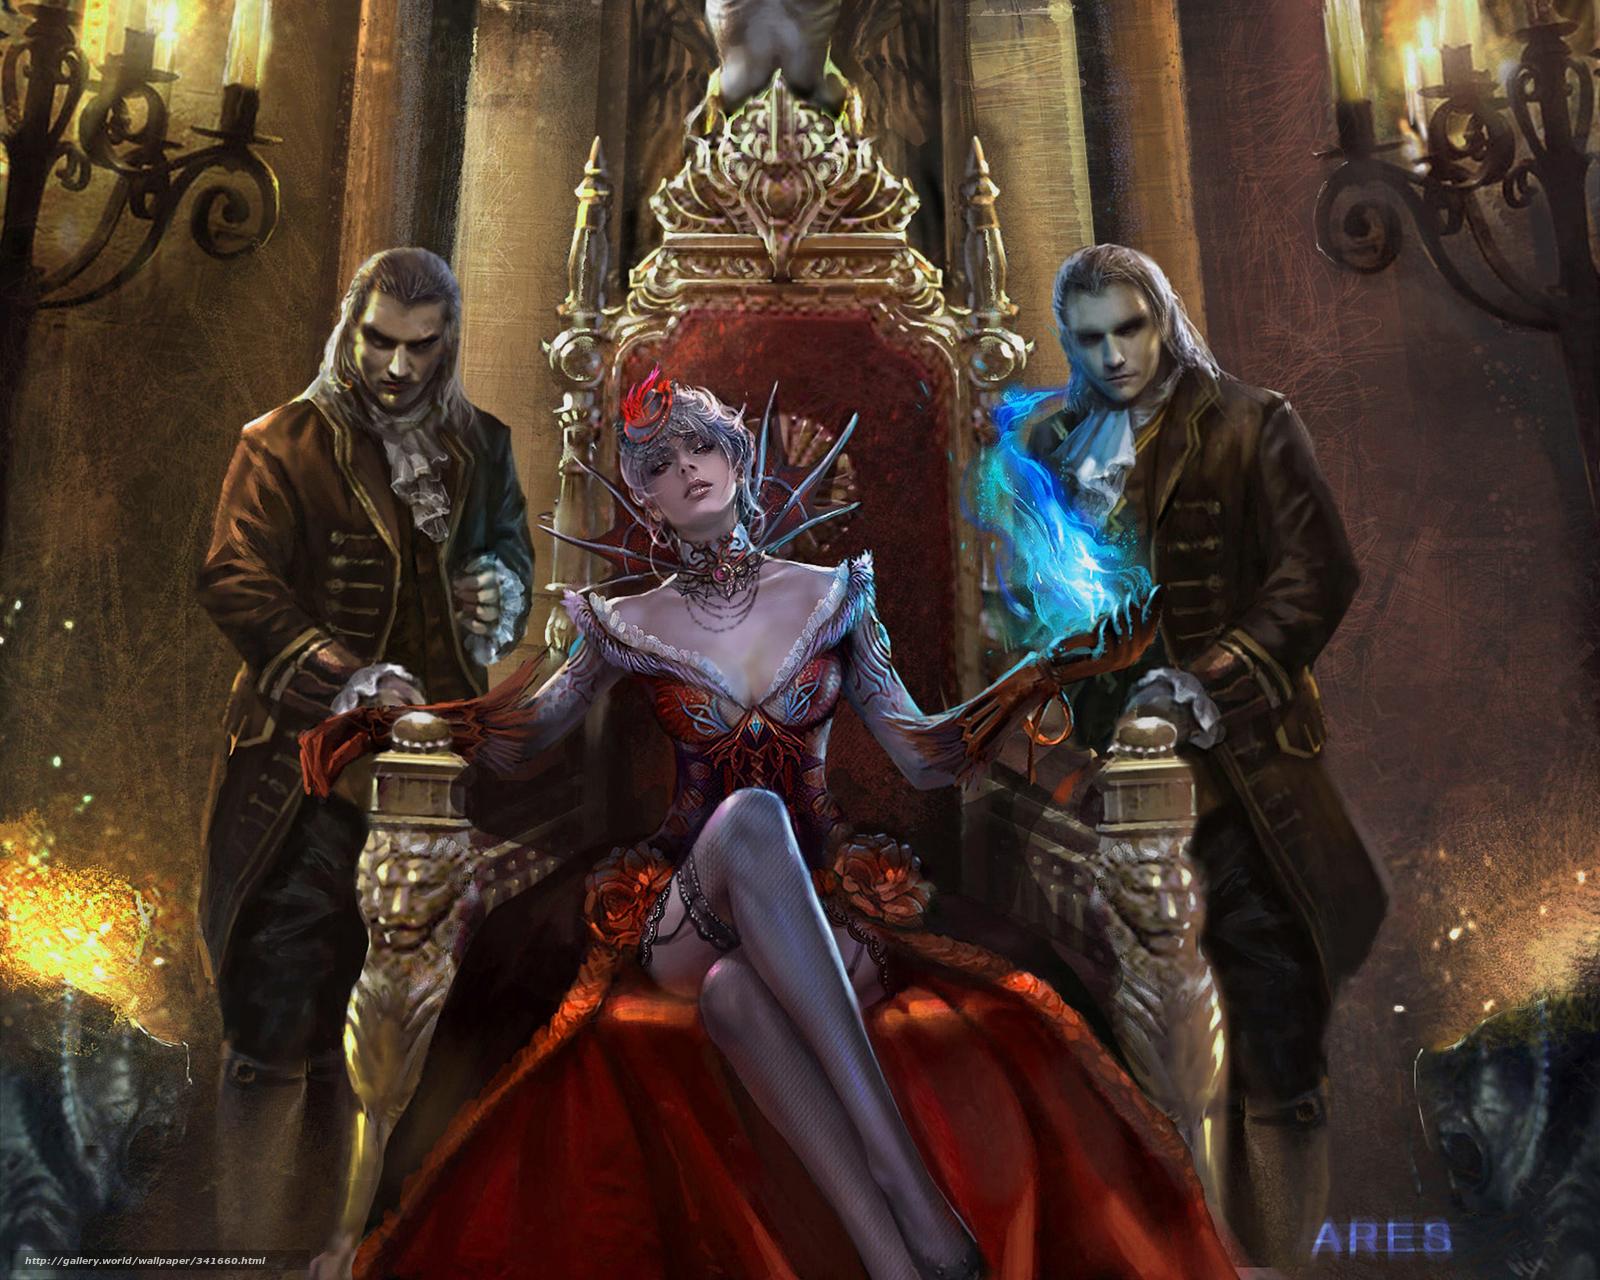 http://st.gdefon.ru/wallpapers_original/wallpapers/341660_koroleva_dvoe-muzhchin_tron_krasnoe_1920x1536.jpg